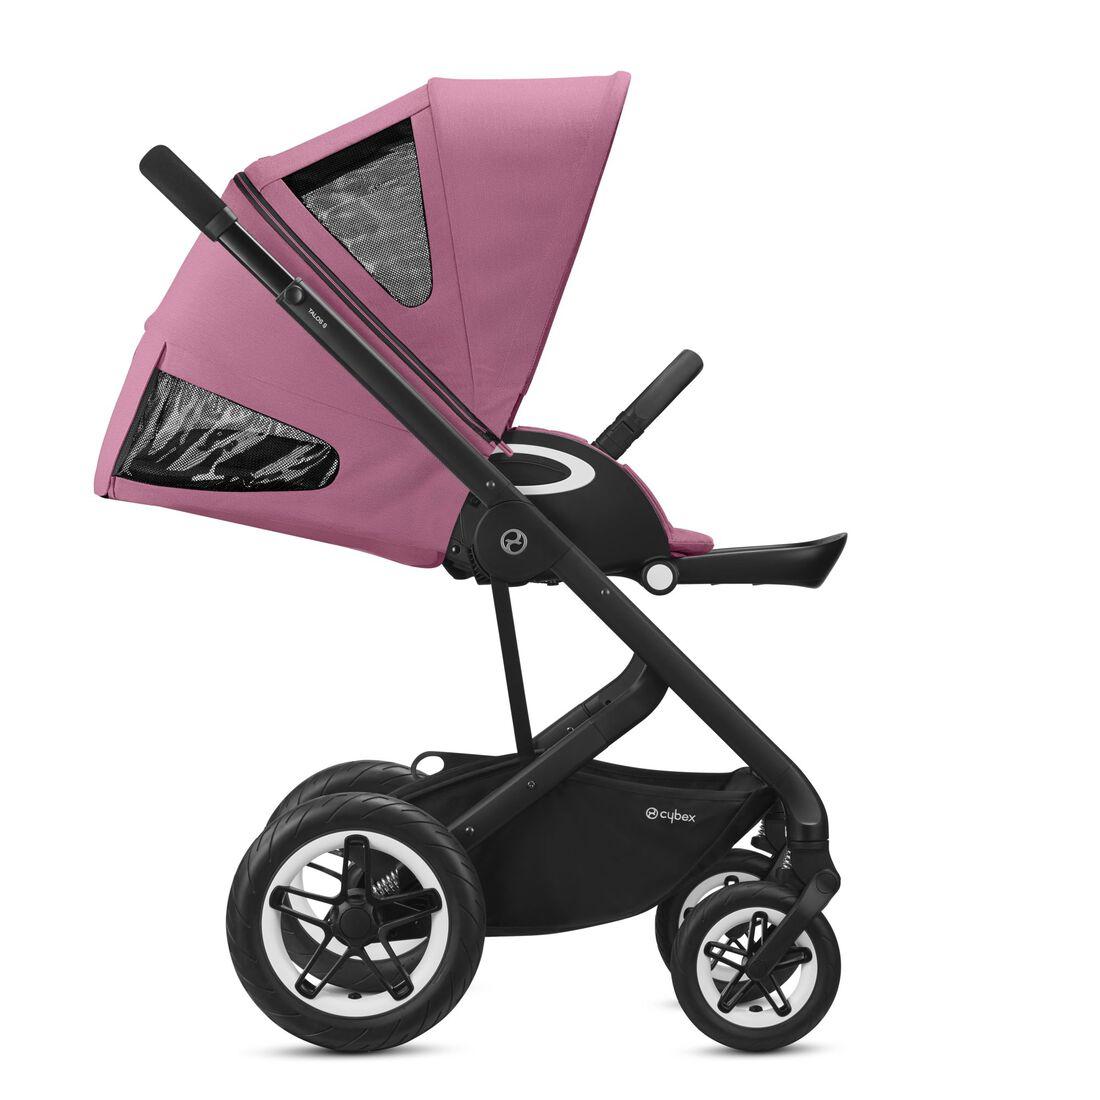 CYBEX Talos S Lux - Magnolia Pink (Schwarzer Rahmen) in Magnolia Pink (Black Frame) large Bild 4